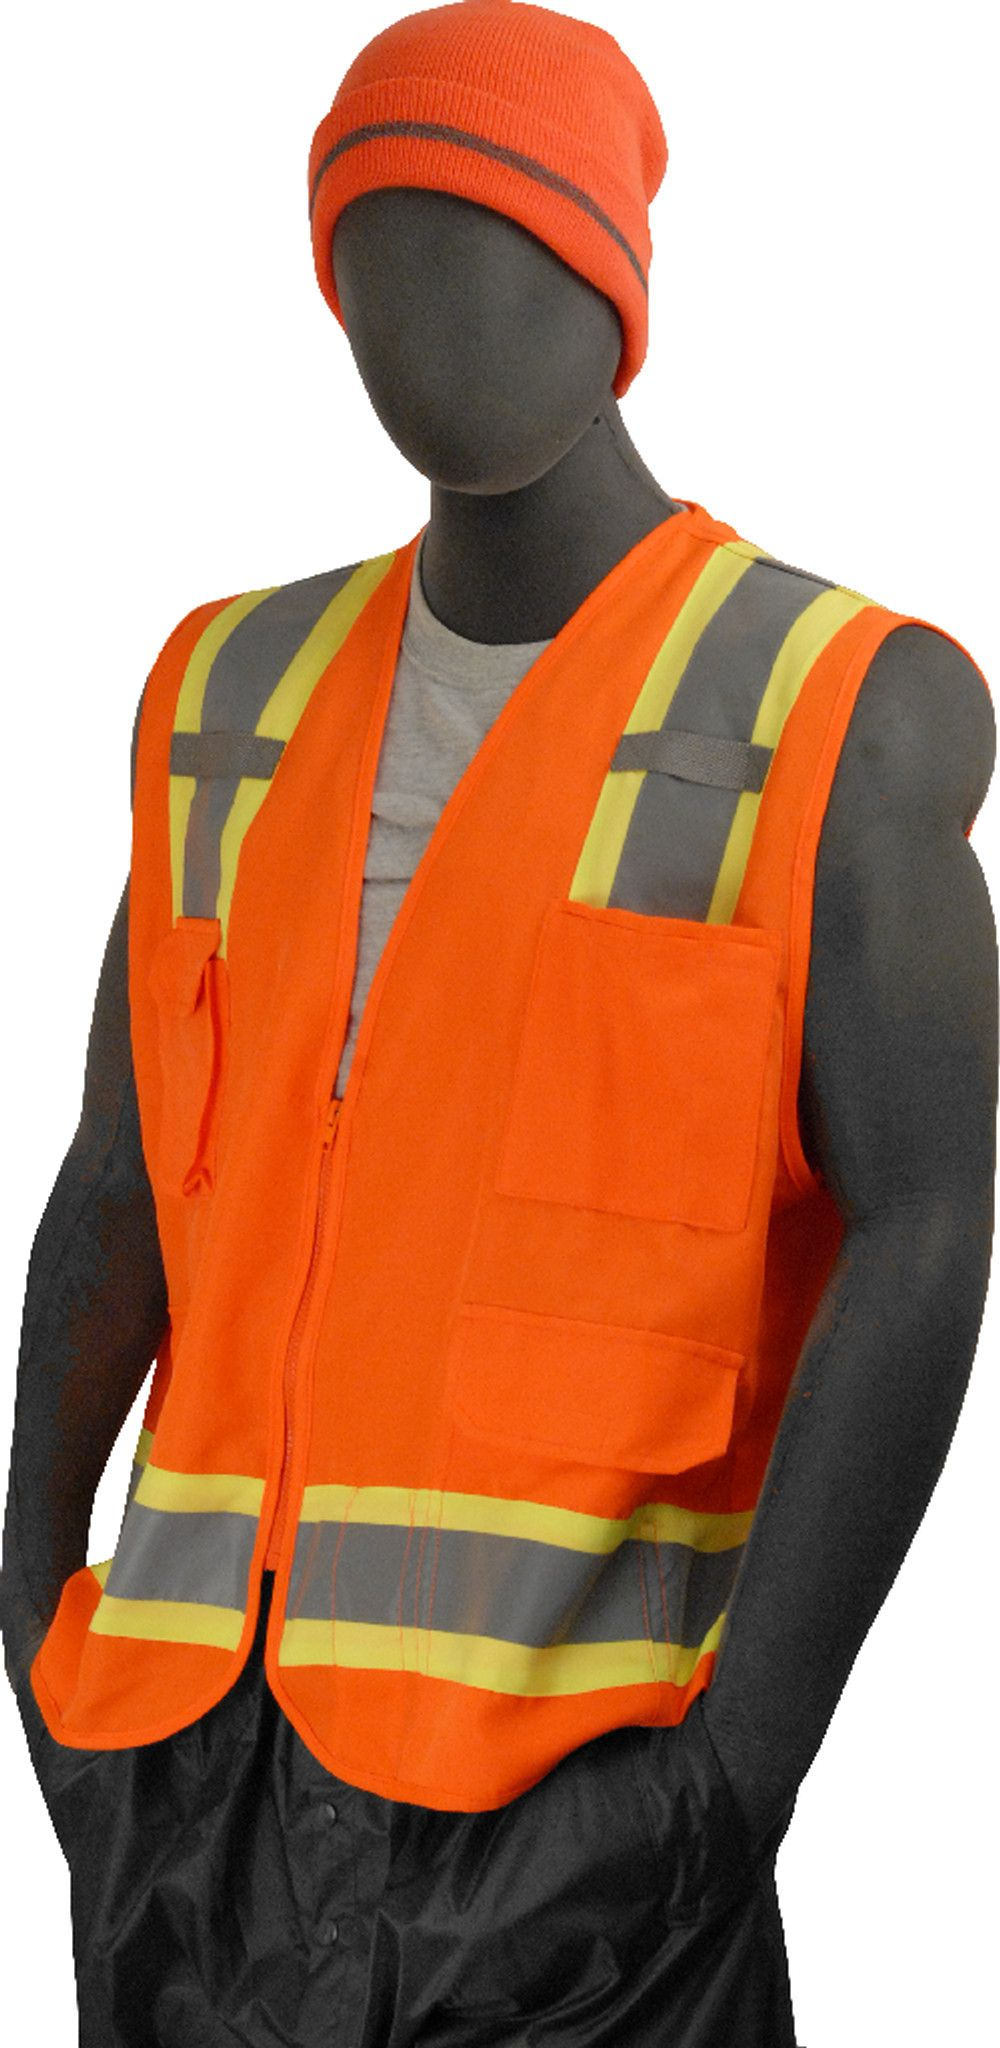 Majestic 753222 Hi Vis Orange Surveyor's Safety Vest ANSI